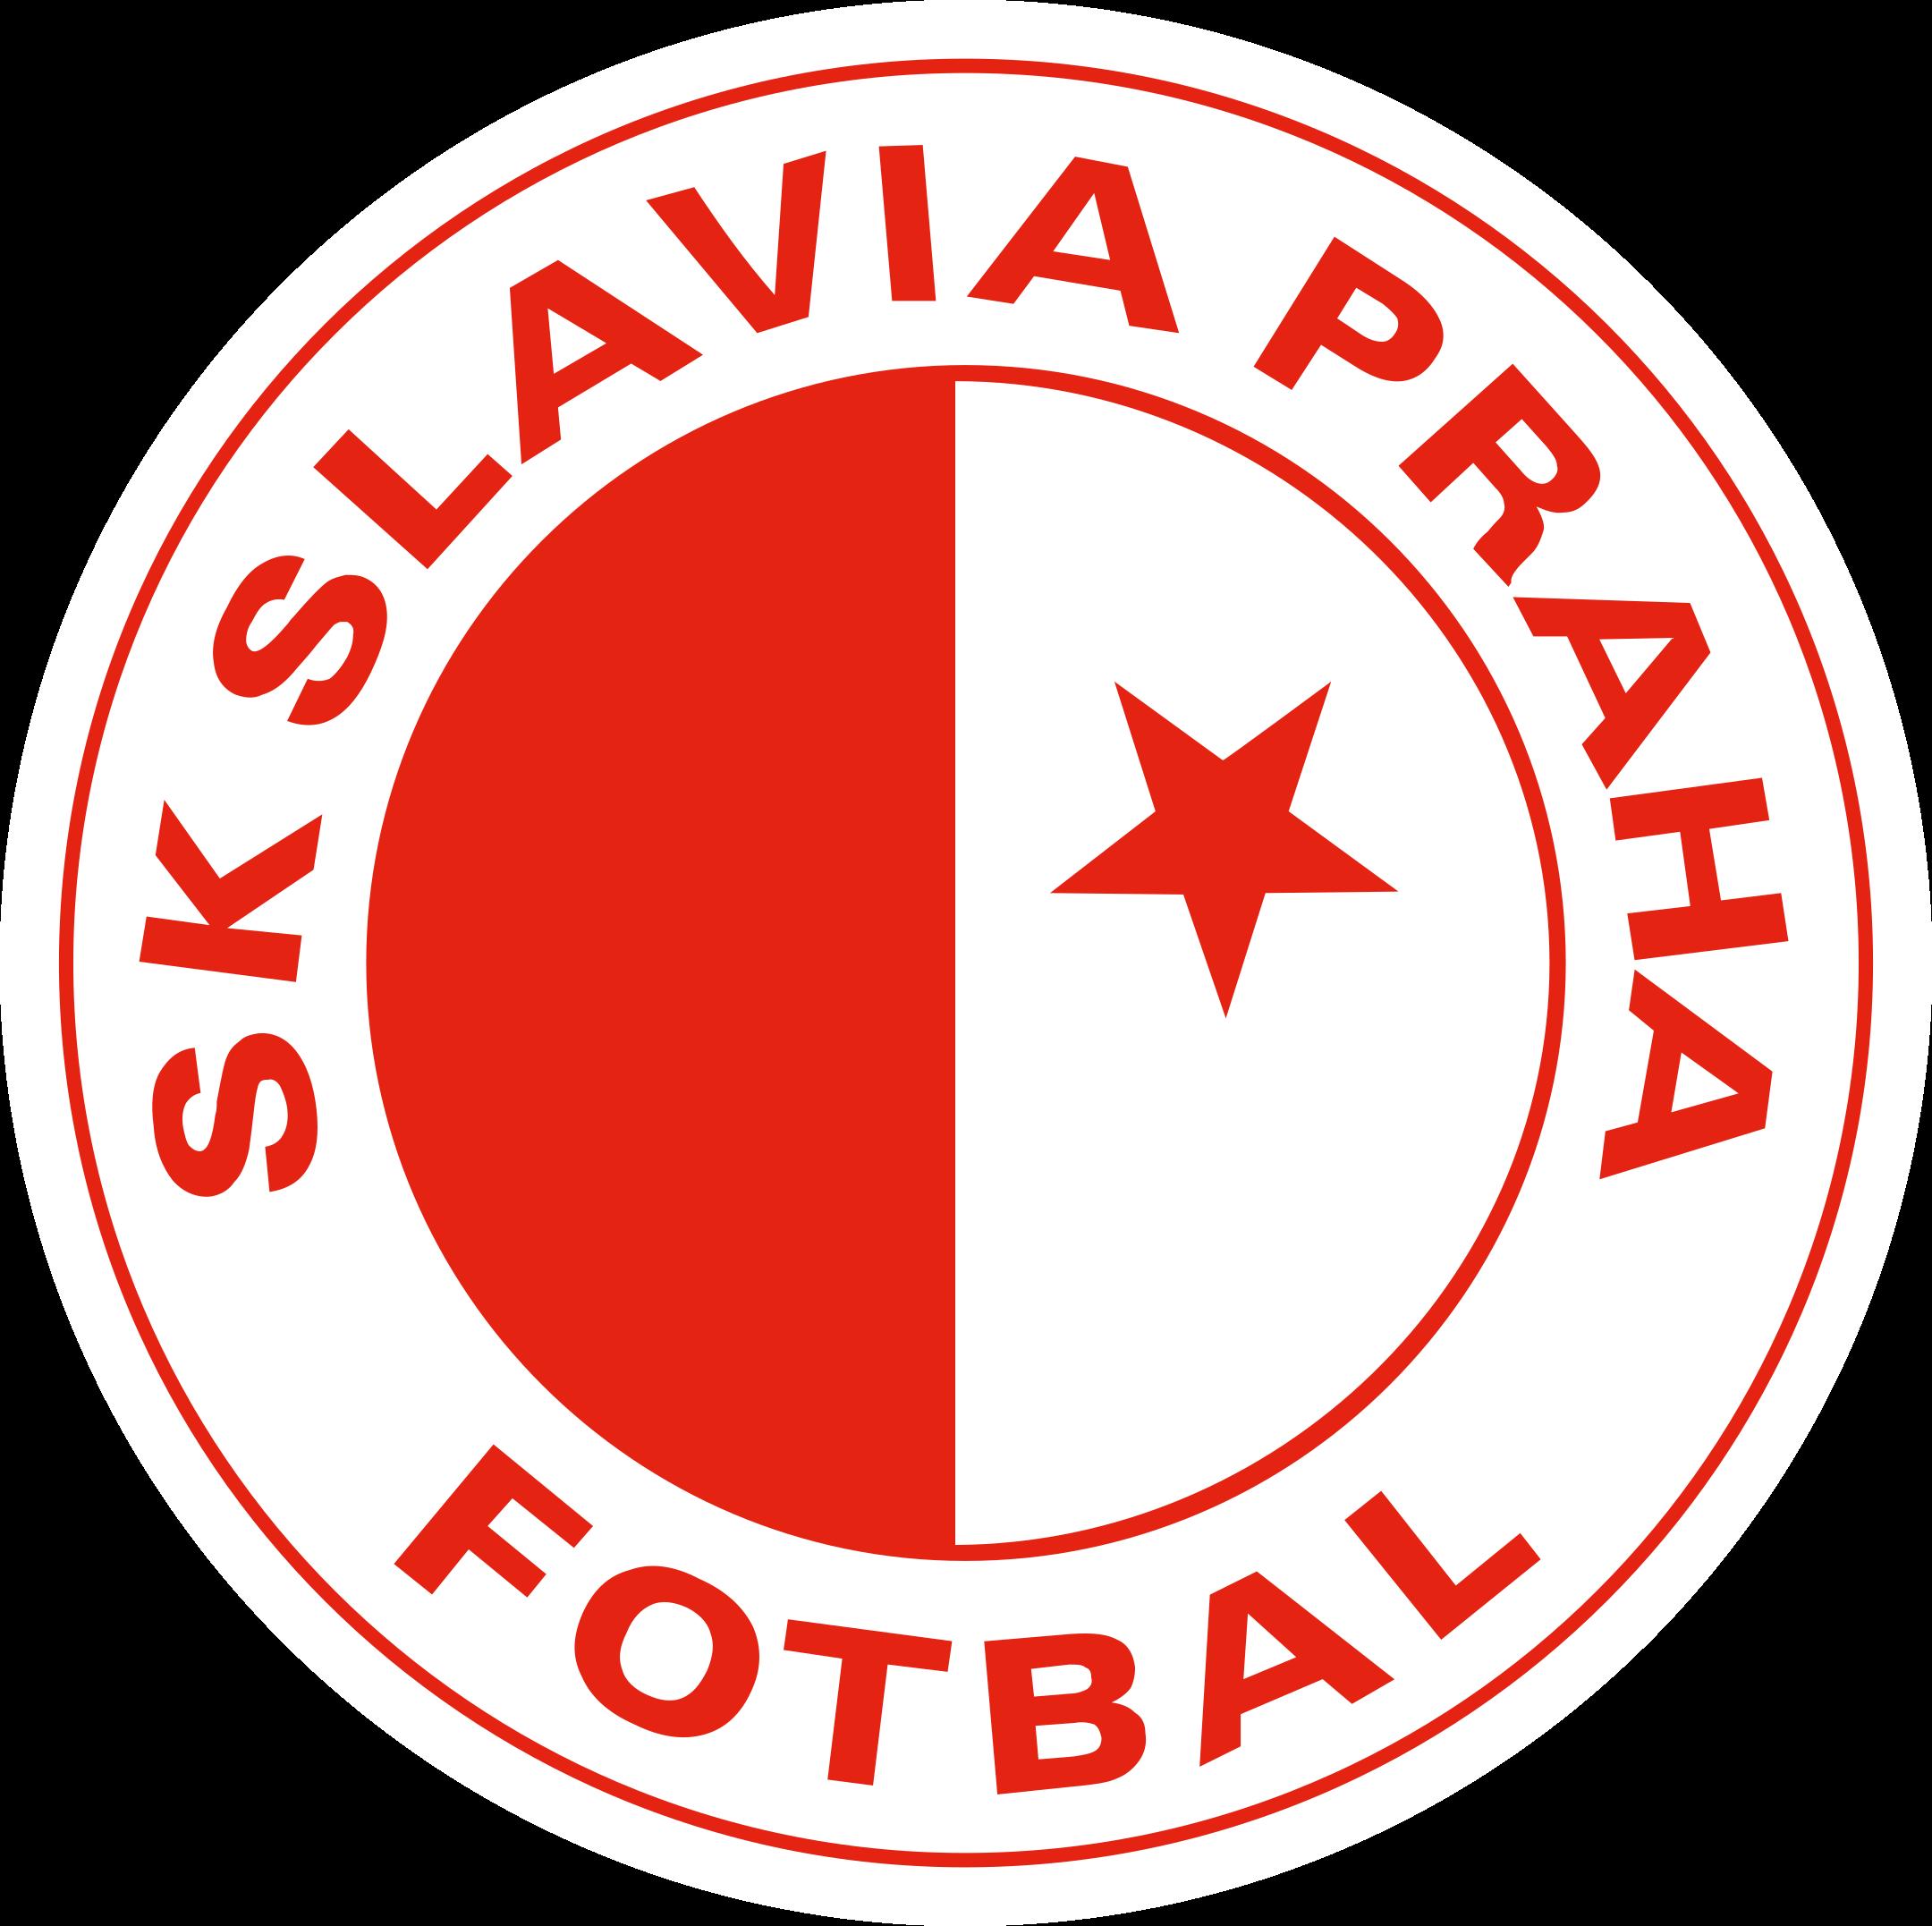 sk slavia praha logo 1 - SK Slavia Praga Logo - Escudo